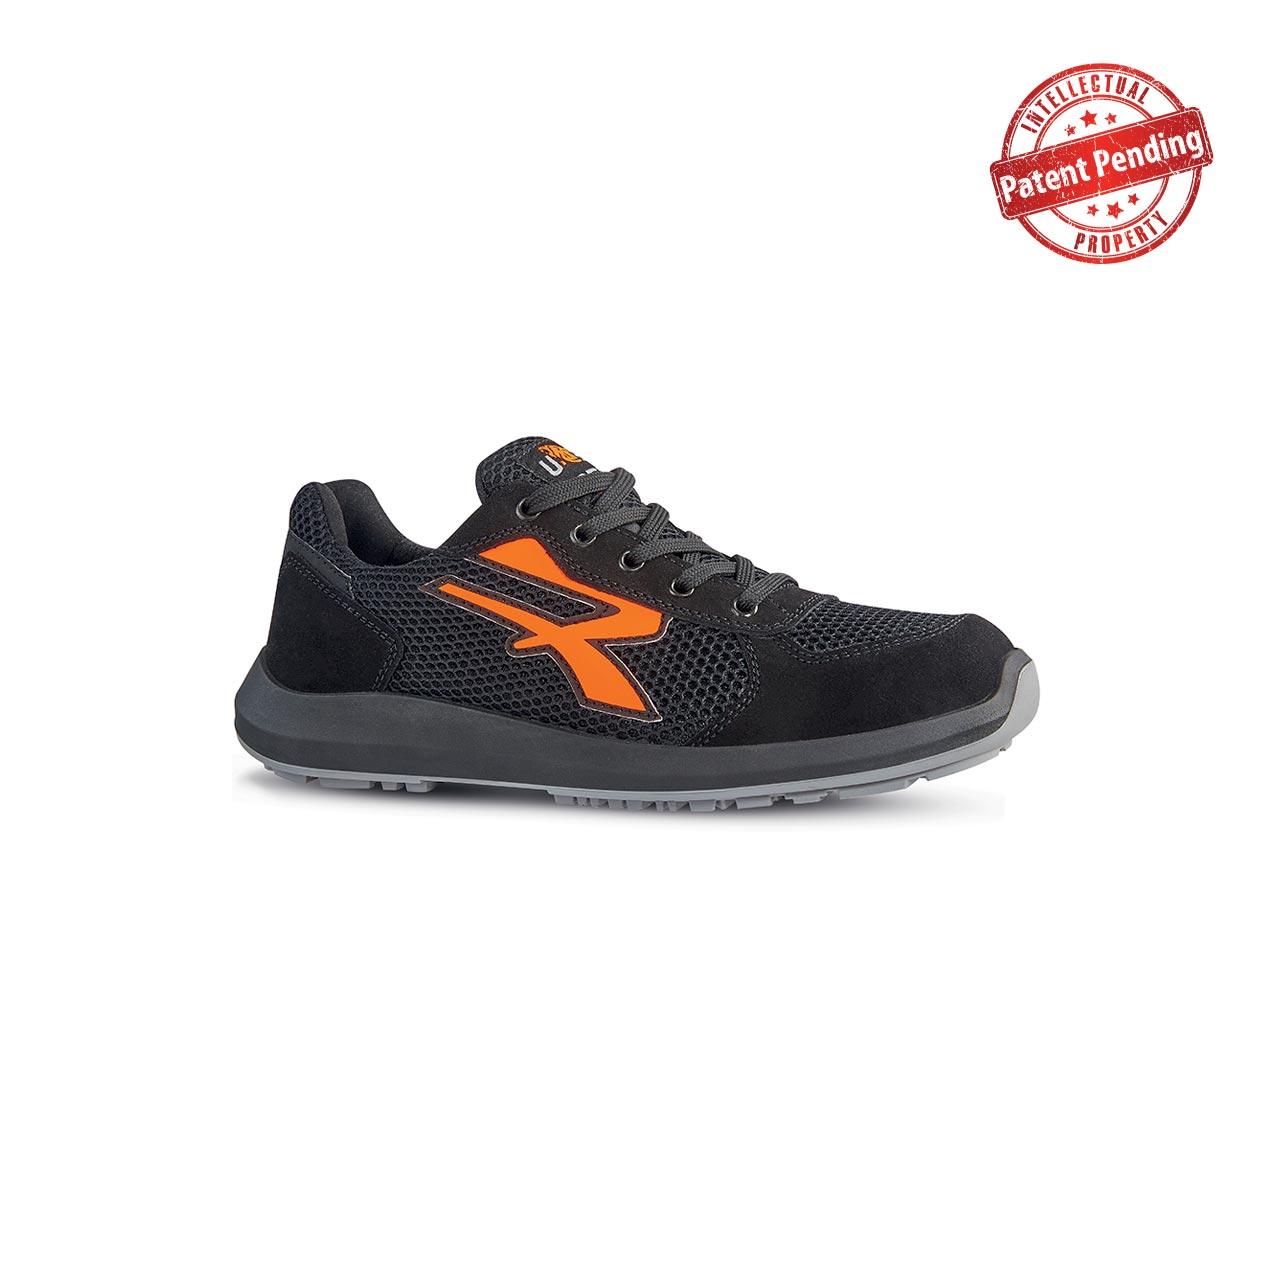 scarpa antinfortunistica upower modello atos linea redup vista laterale